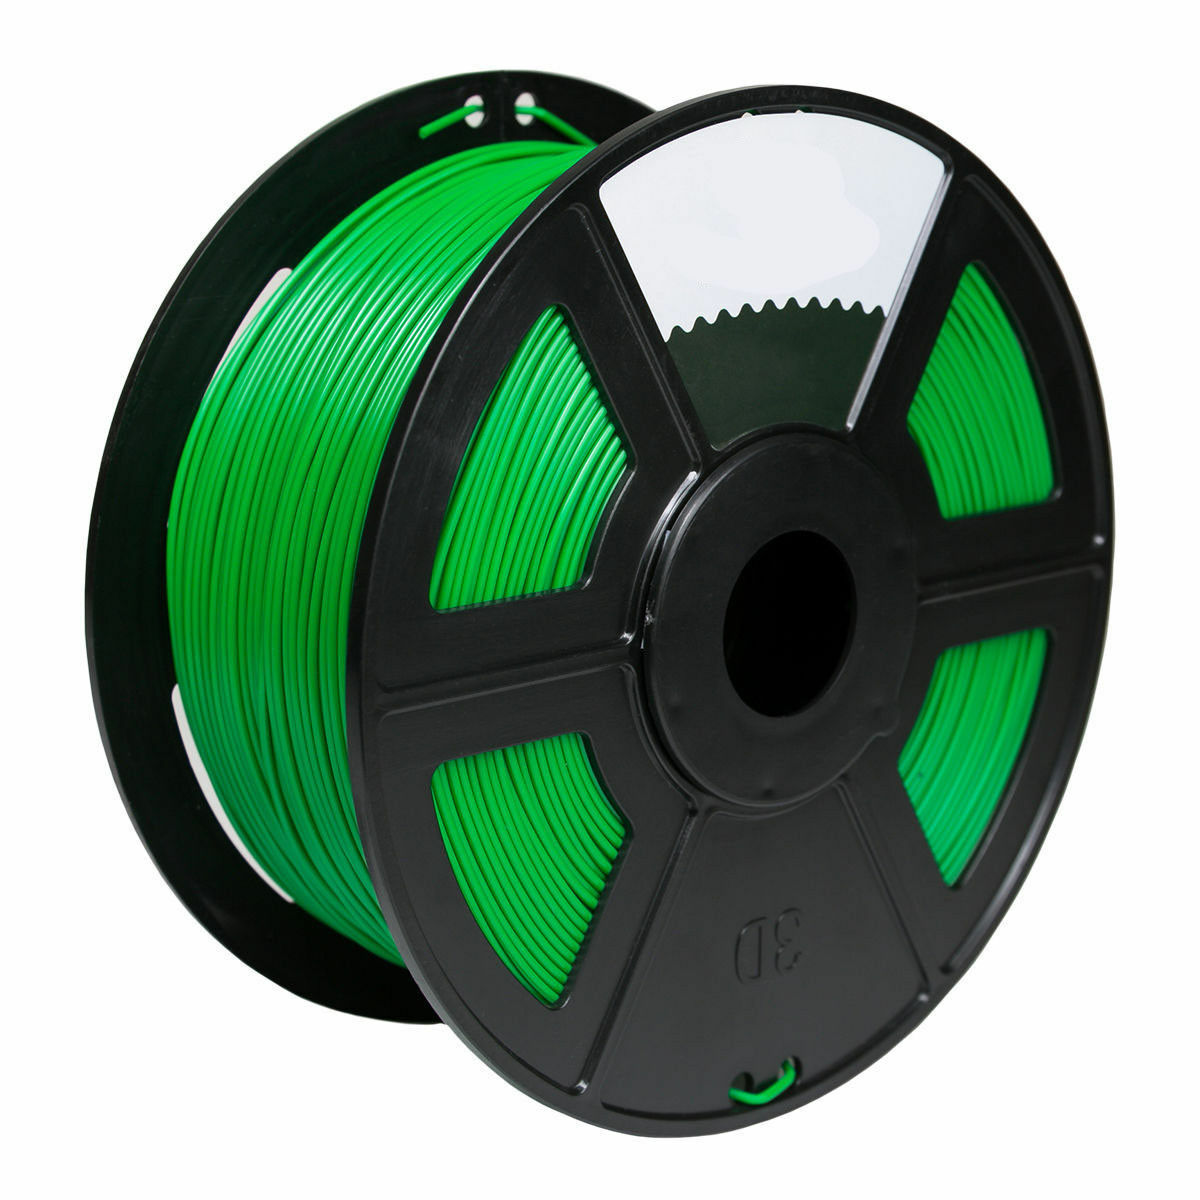 2PK Green Color 3D Printer Filament 1.75mm 1KG ABS For Print MakerBot RepRap